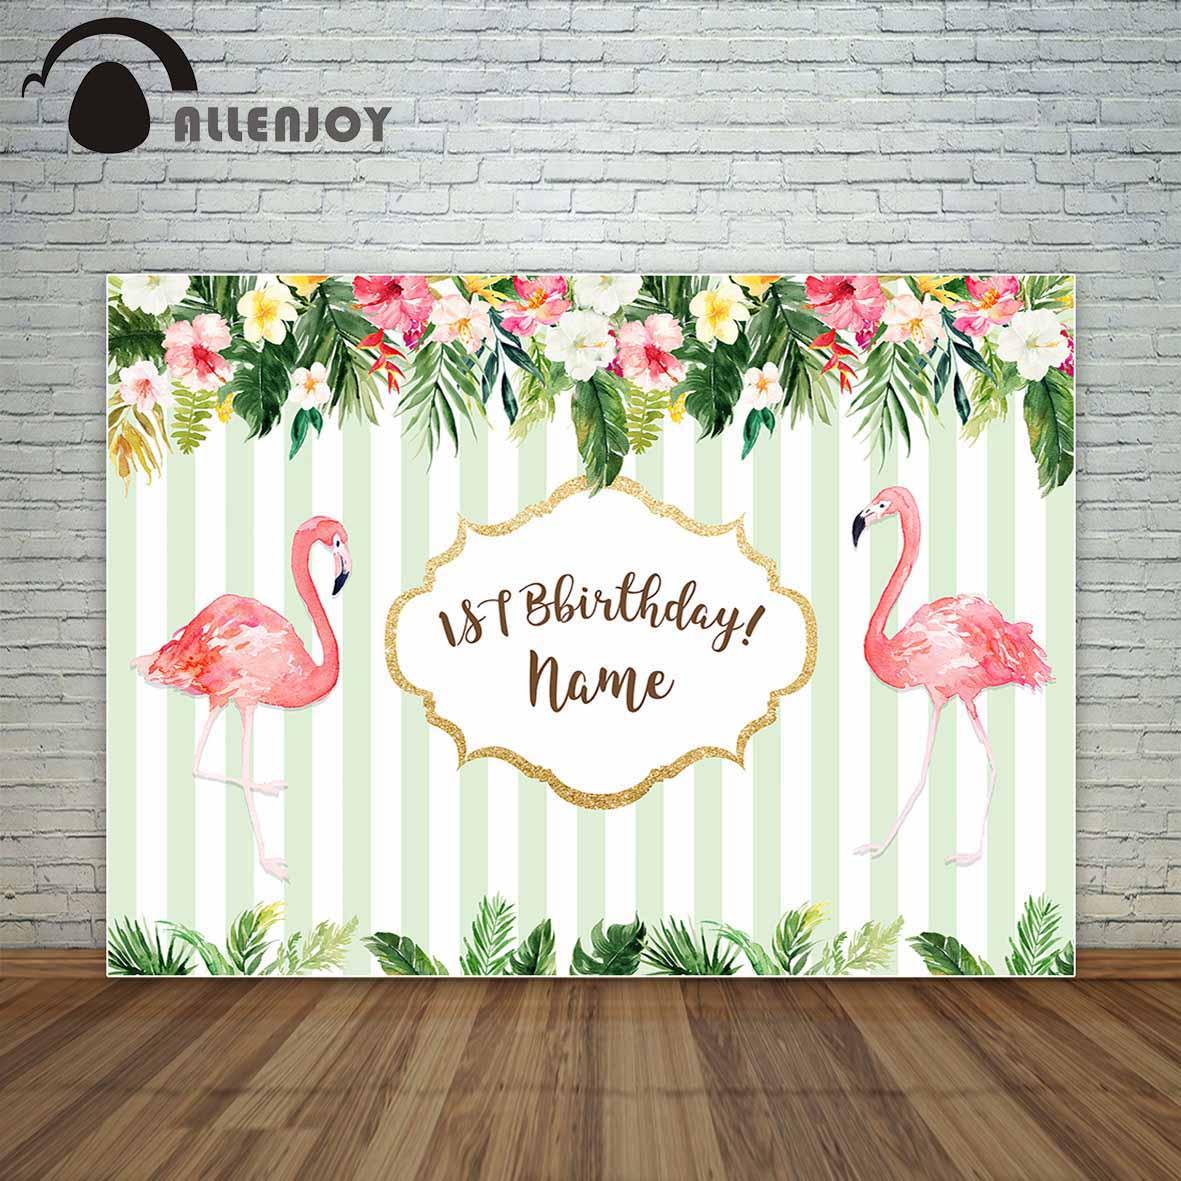 Allenjoy birthday custom backdrop flamingo tropical theme background flowers white and green stripes photography backdrops 3 5m vinyl custom photography backdrops prop indoor theme studio background gc 4272